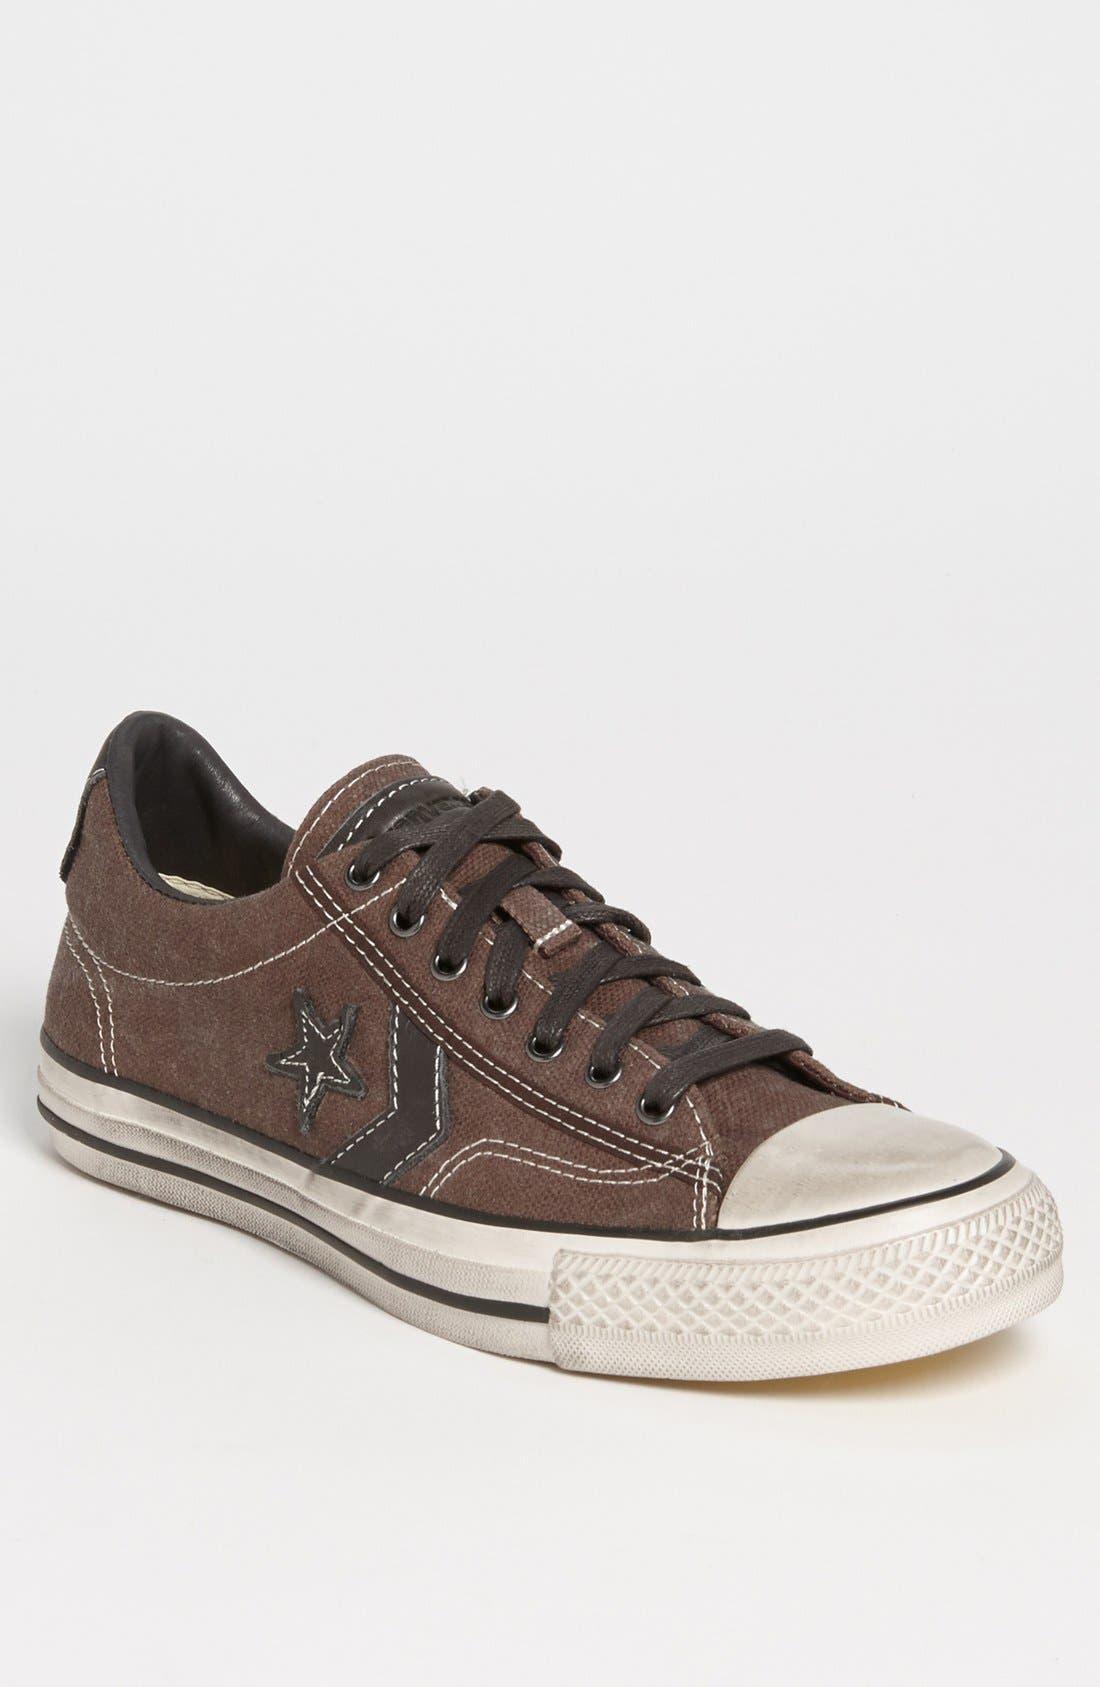 Main Image - Converse by John Varvatos 'Star Player' Sneaker (Men)